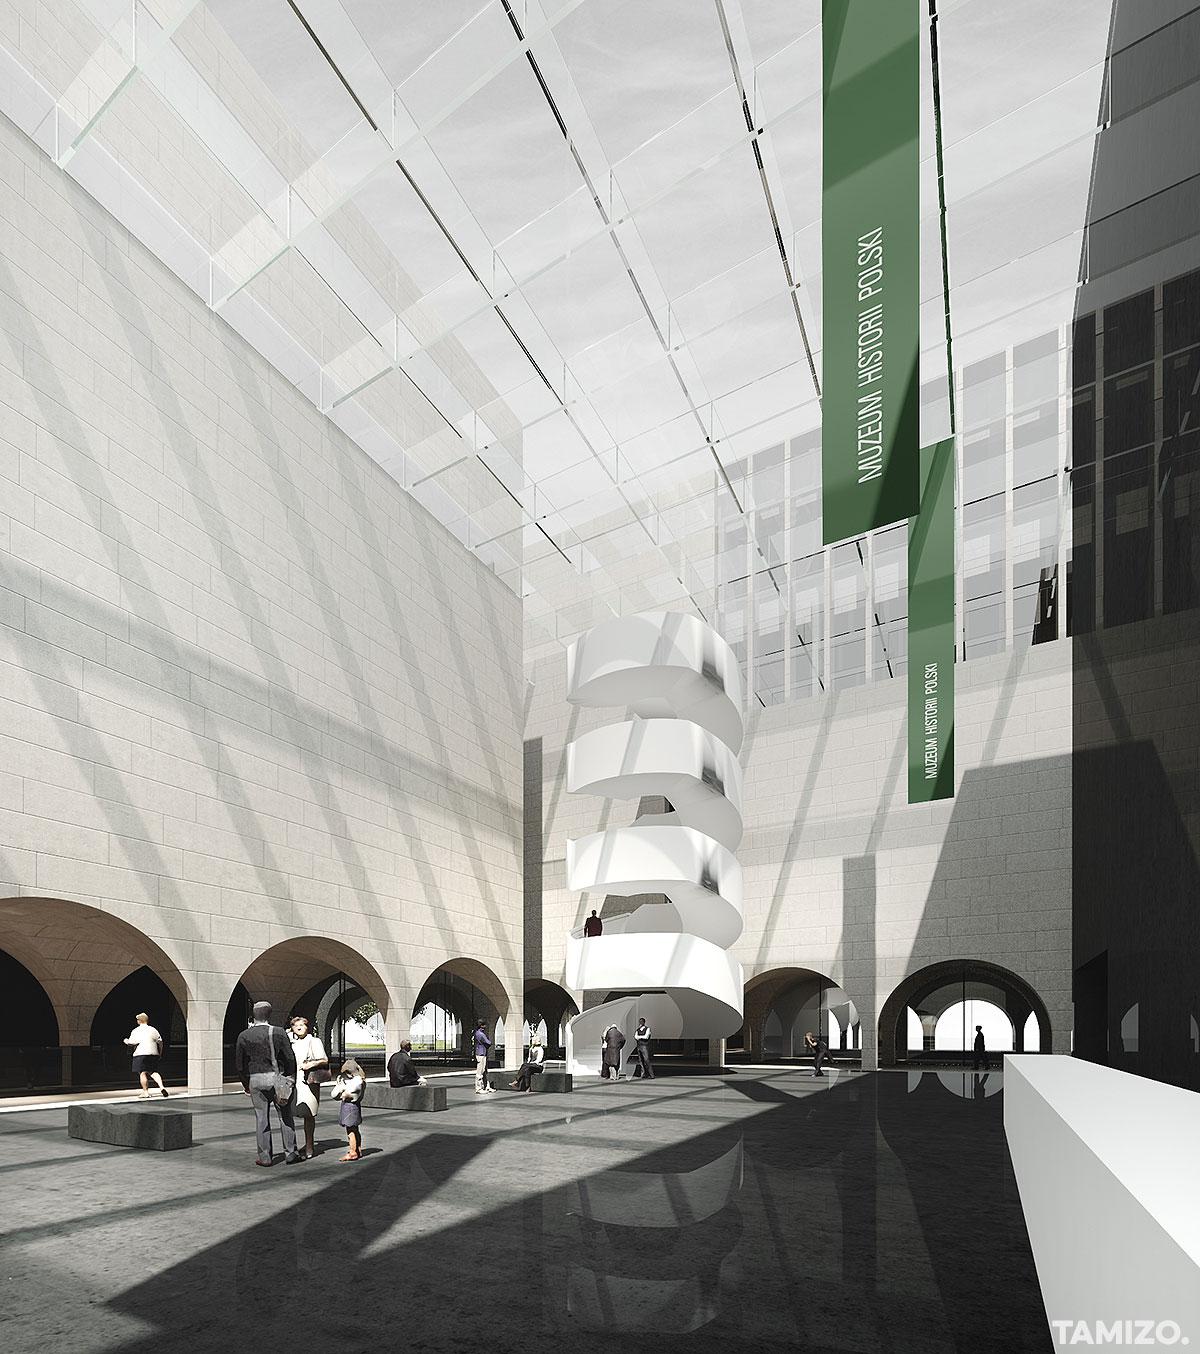 A037_tamizo_architekci_projekt_konkurs_muzeum_historii_polski_01